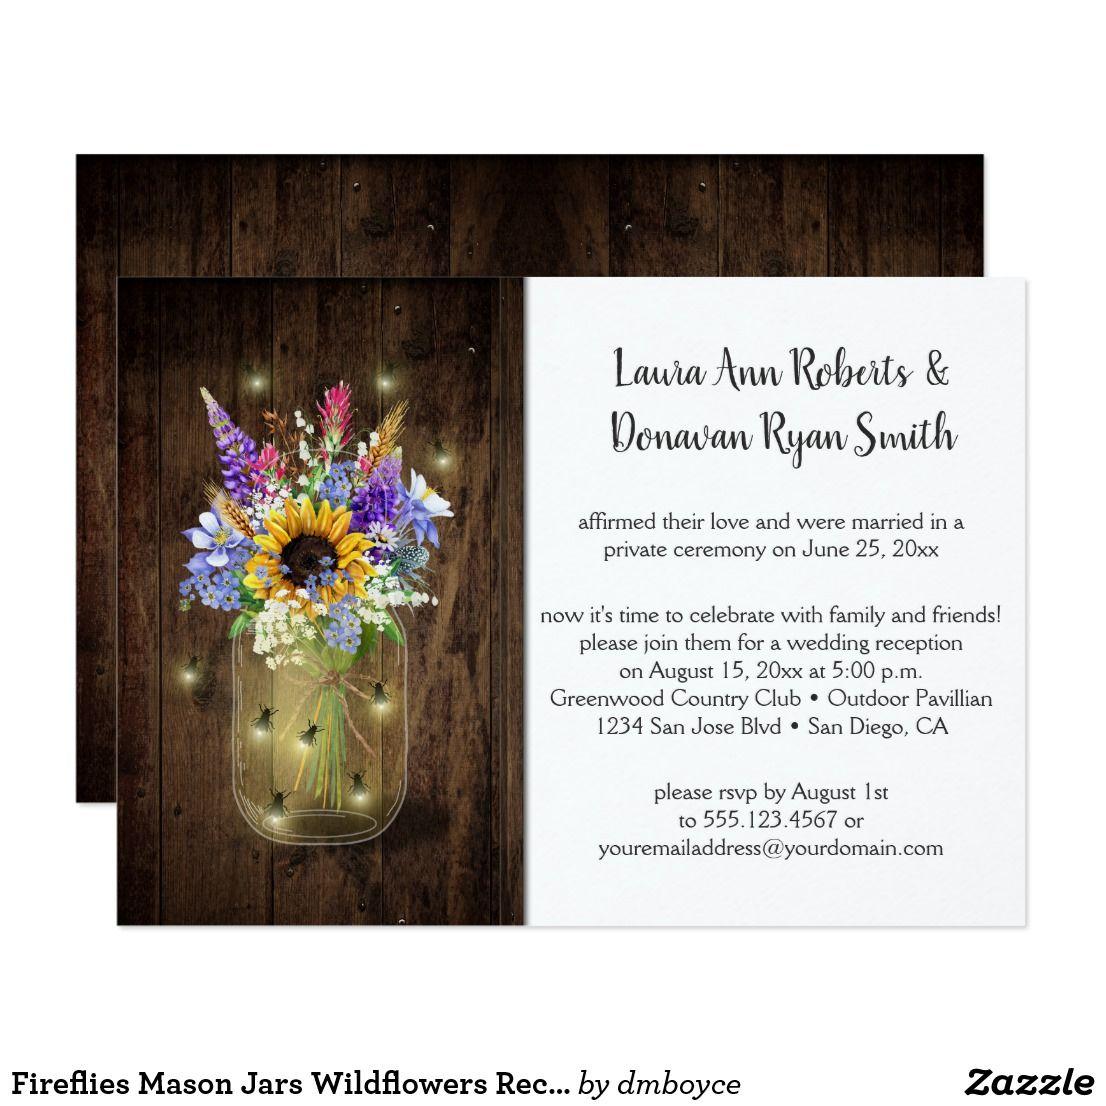 Fireflies Mason Jars Wildflowers Reception Only Invitation ...